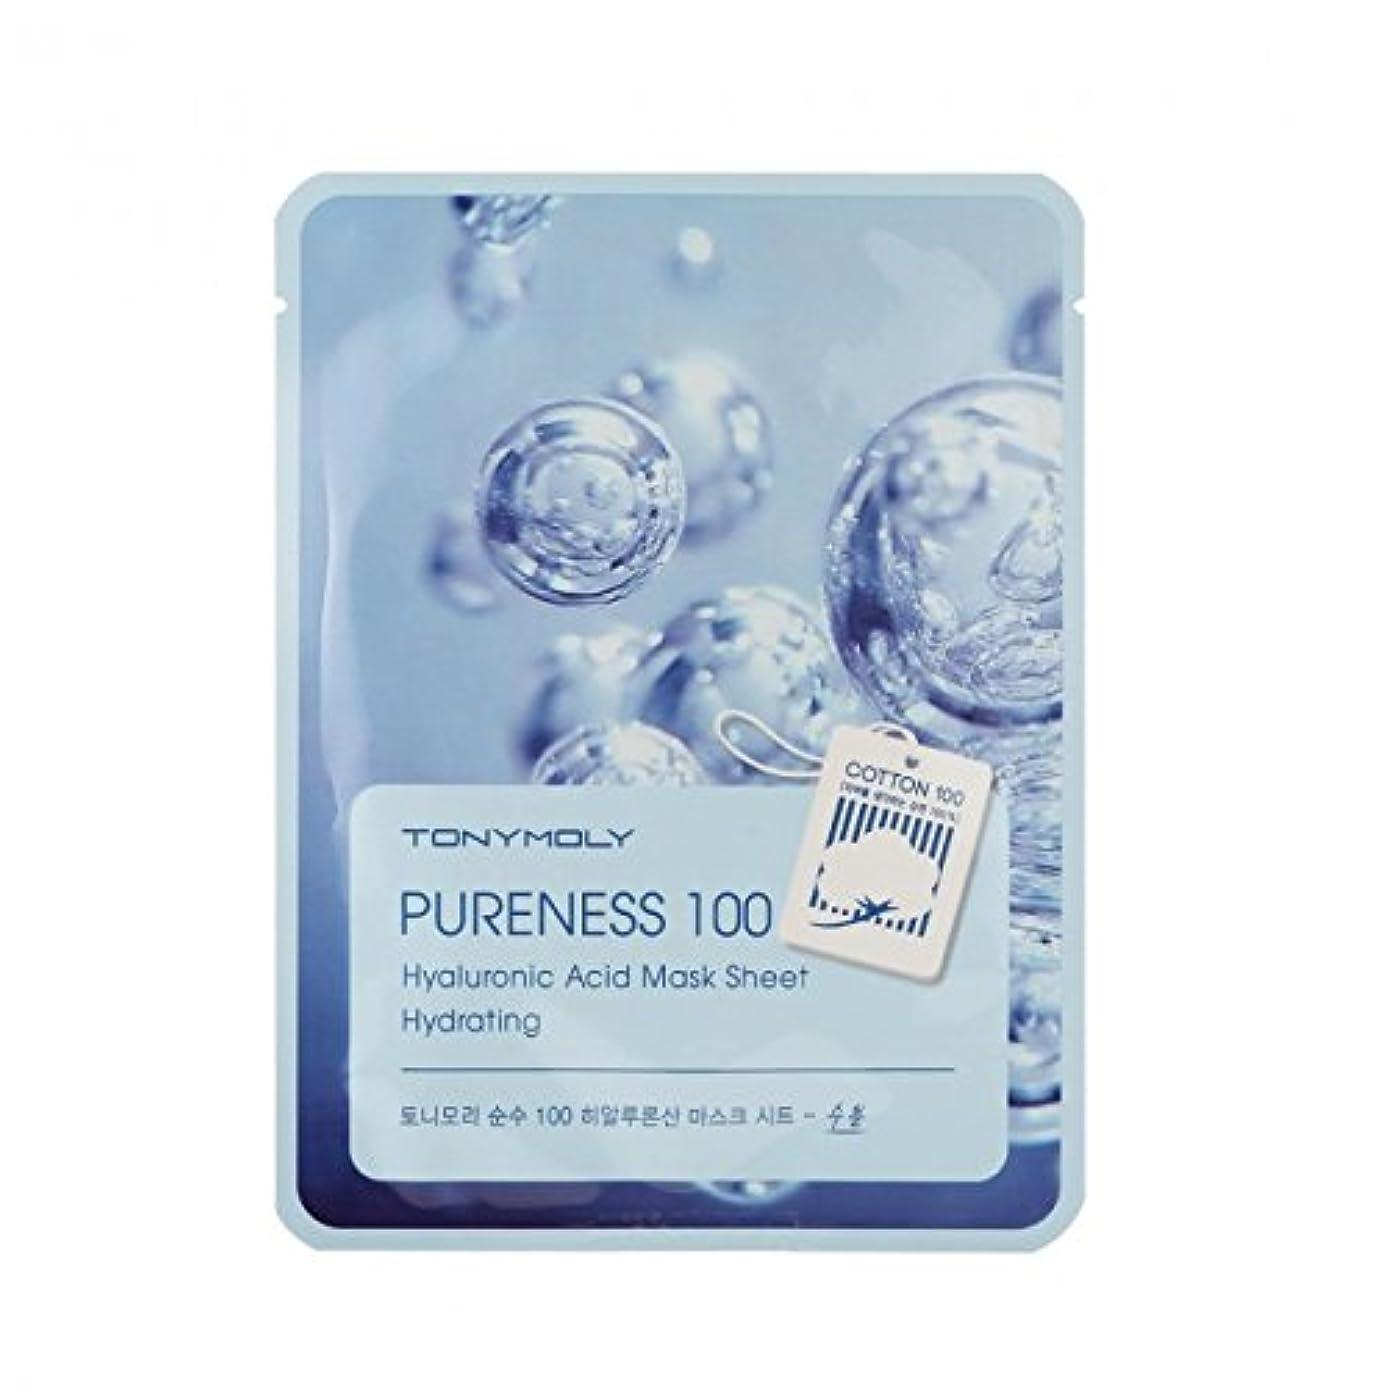 TONYMOLY Pureness 100 Hyaluronic Acid Mask Sheet Hydrating (並行輸入品)